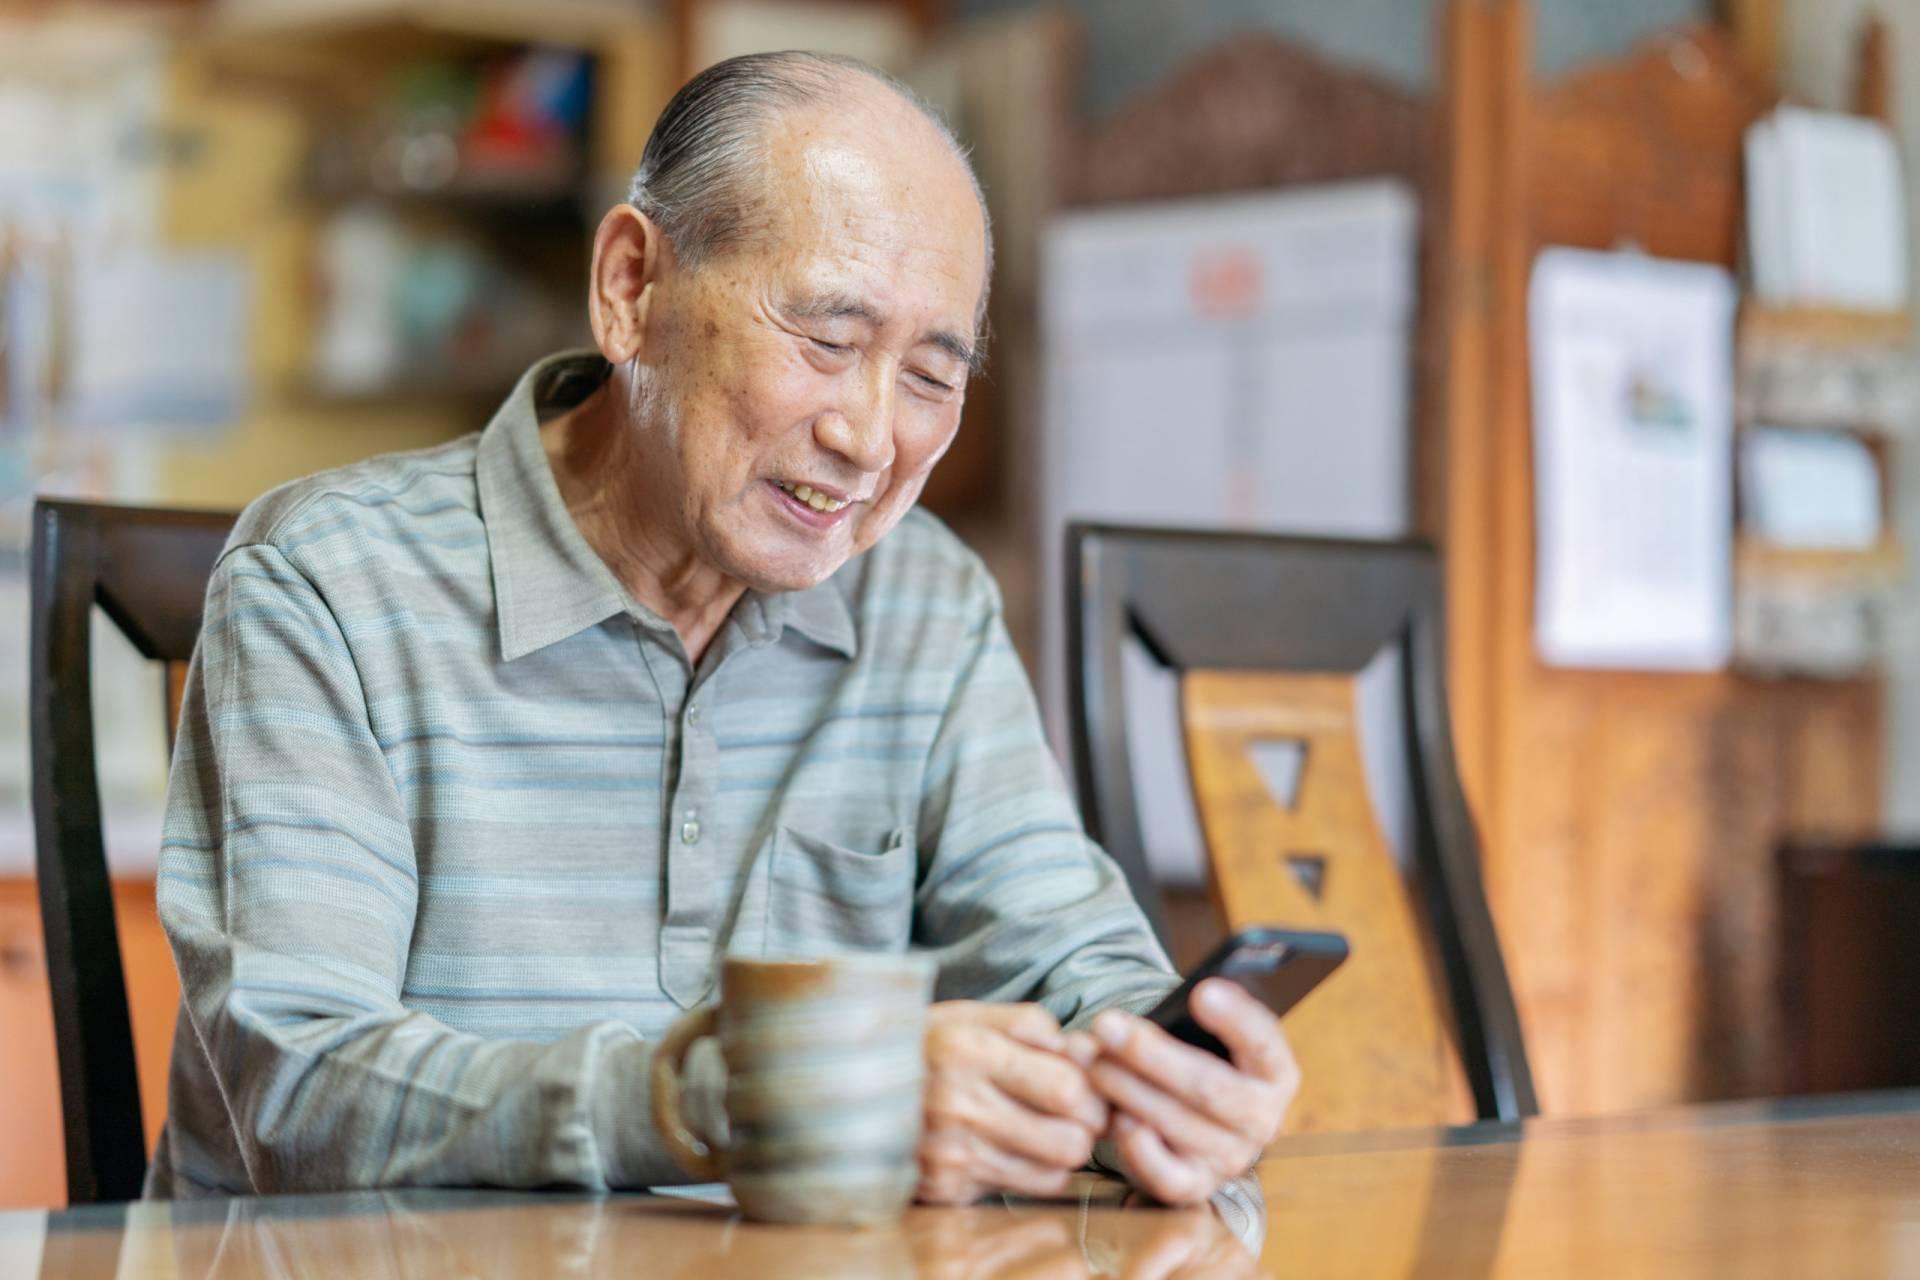 Portrait of senior man while using smart phone